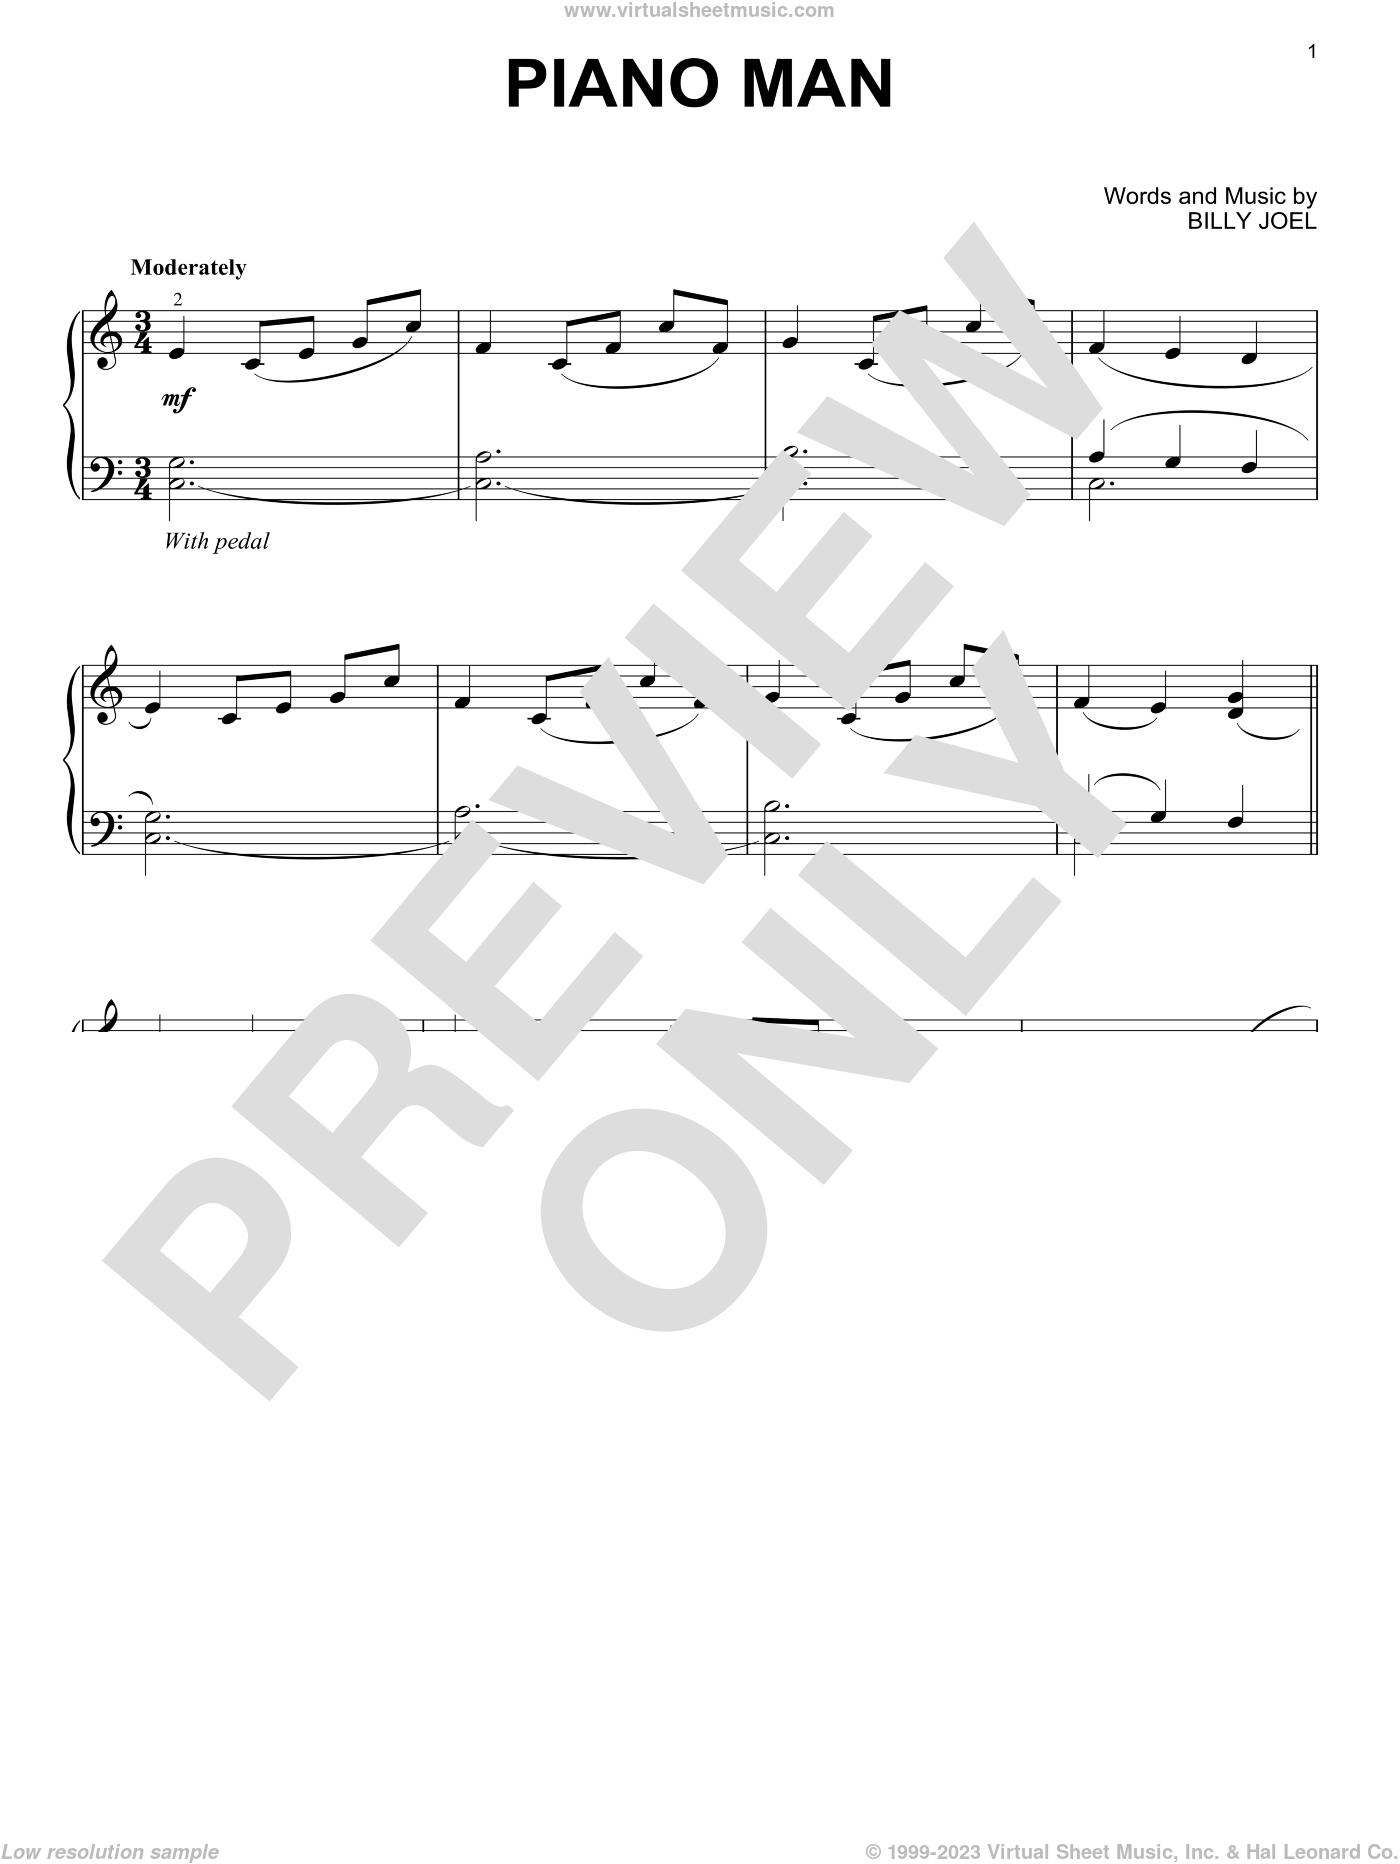 Piano Man, (intermediate) sheet music for piano solo by Billy Joel, intermediate skill level